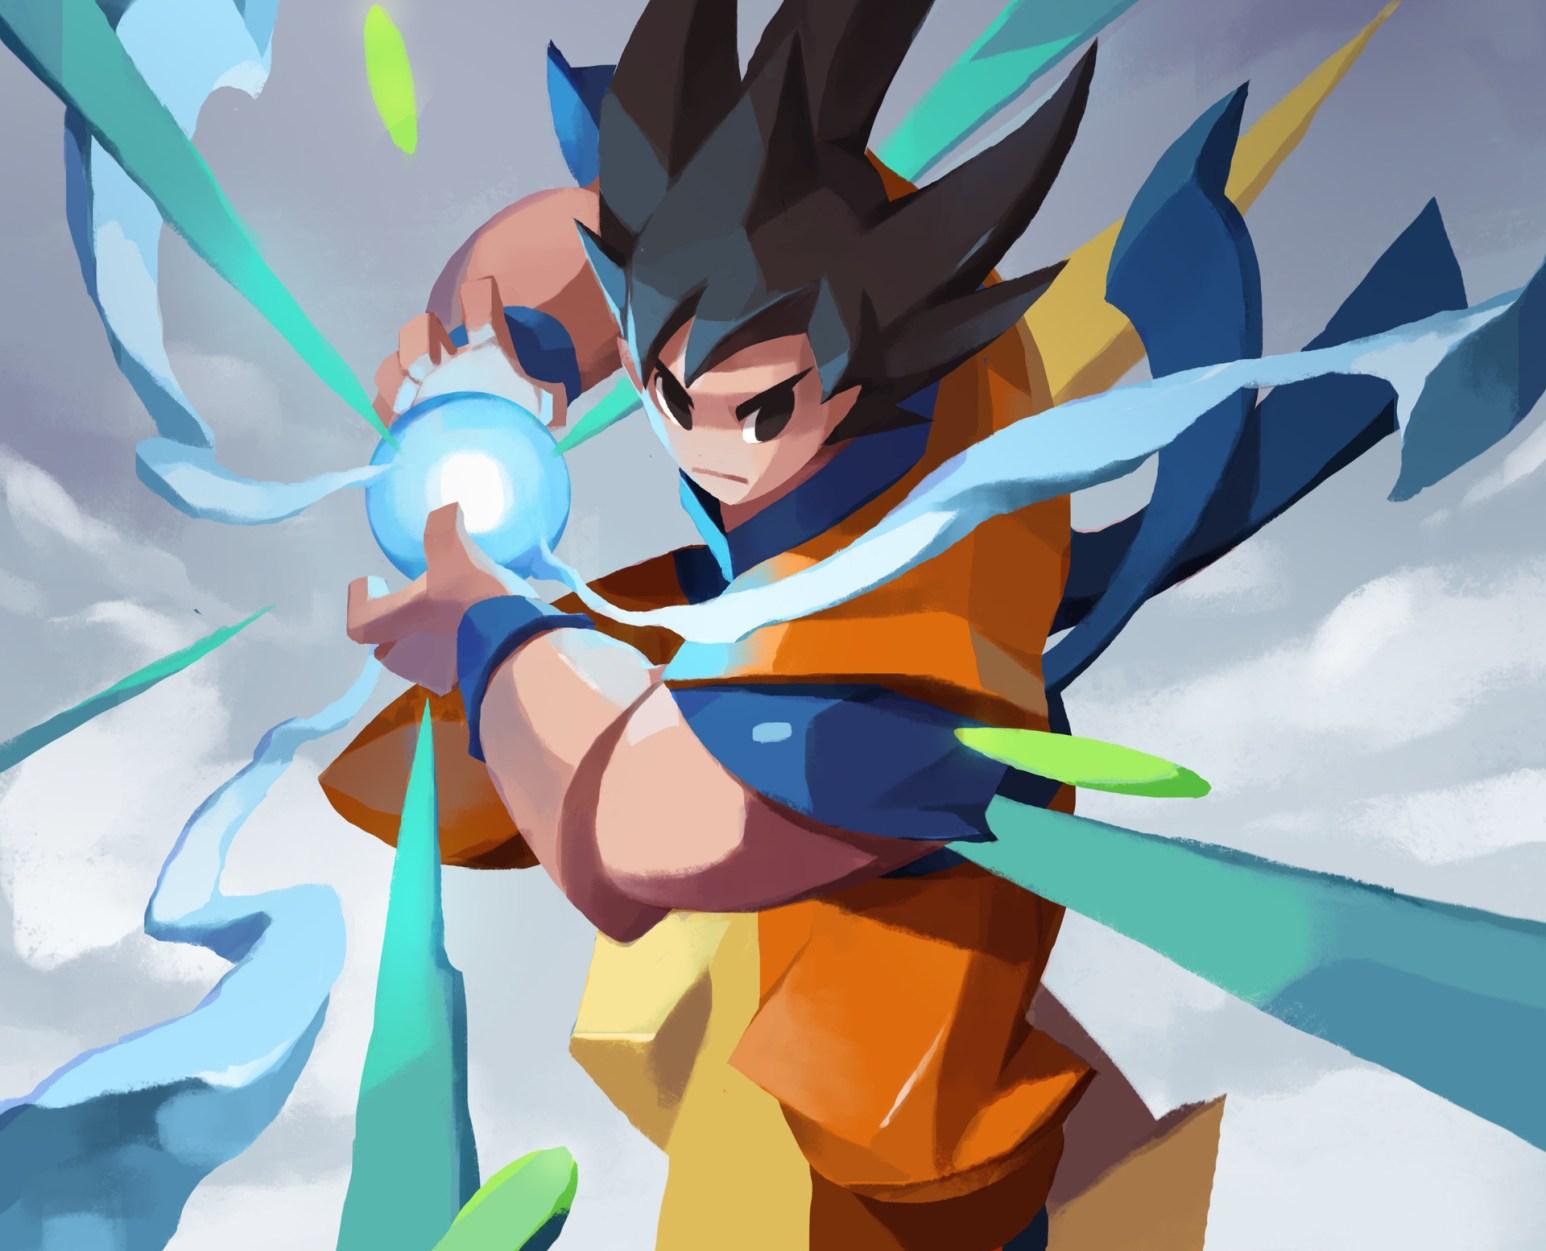 Goku charging up